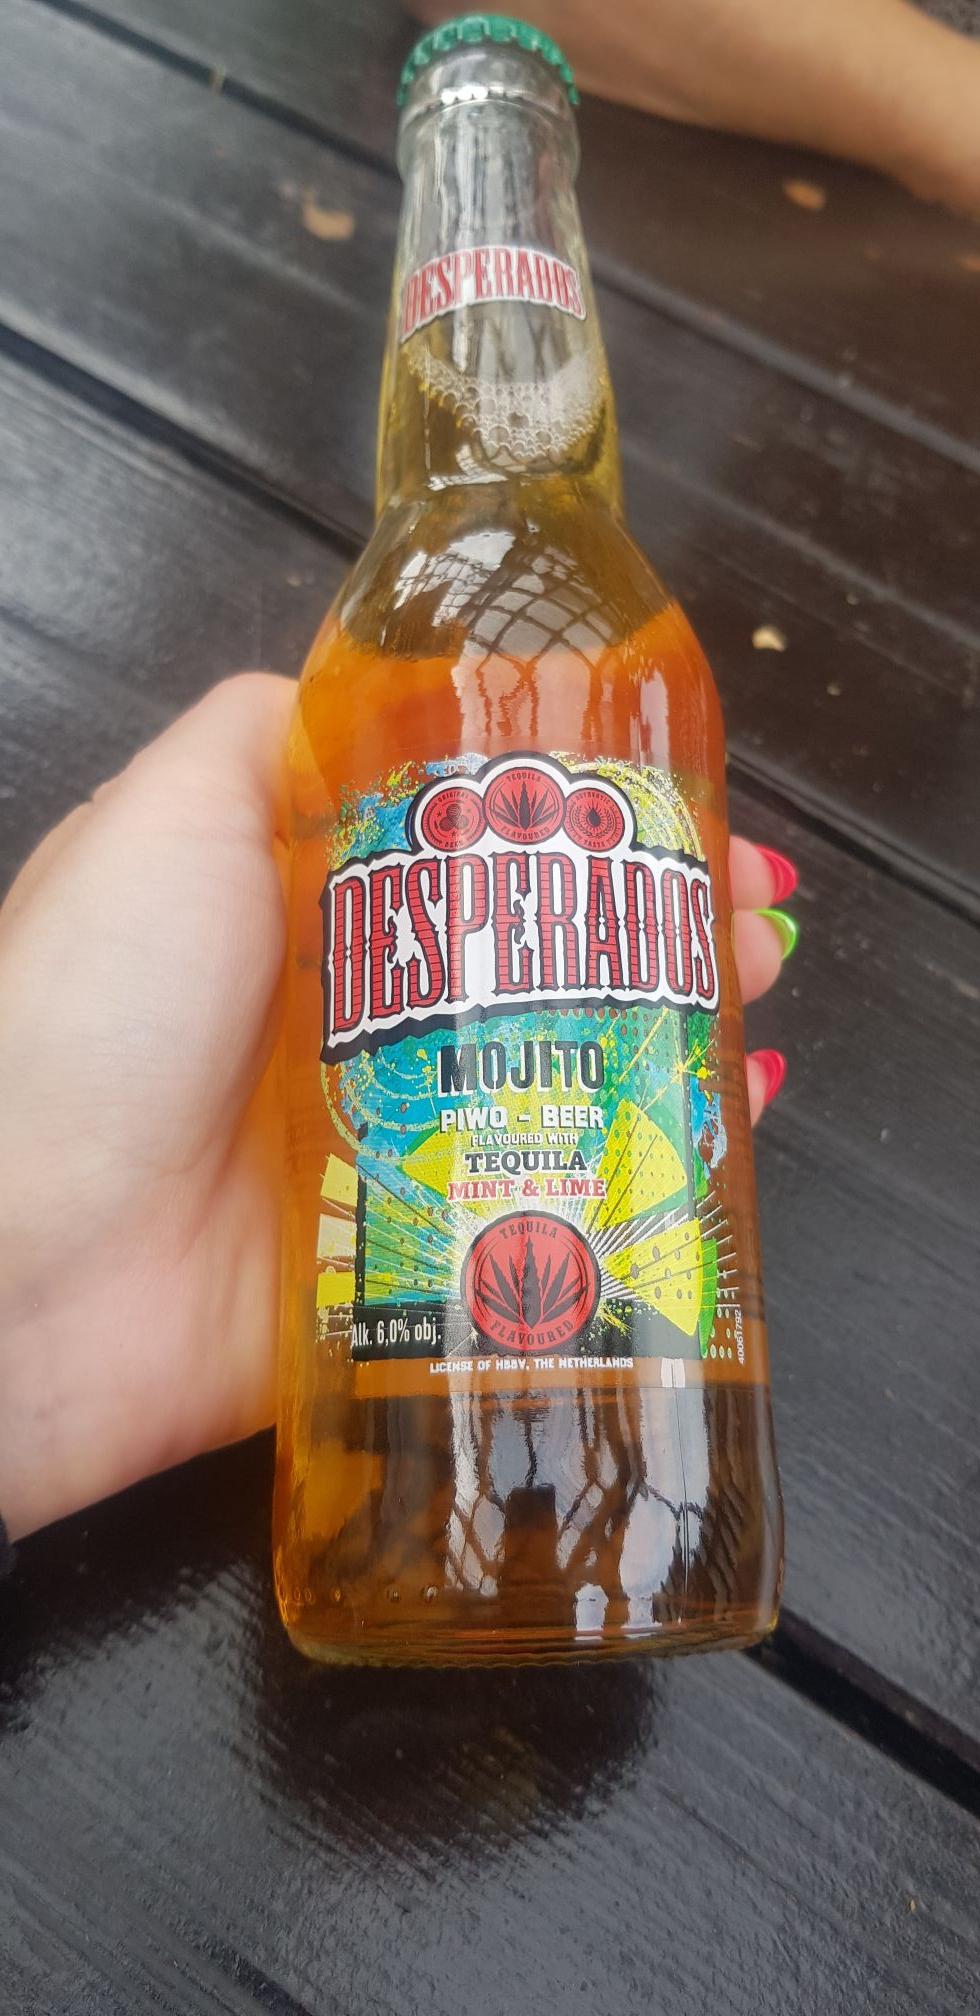 Darmowe piwo Desperados Karwia